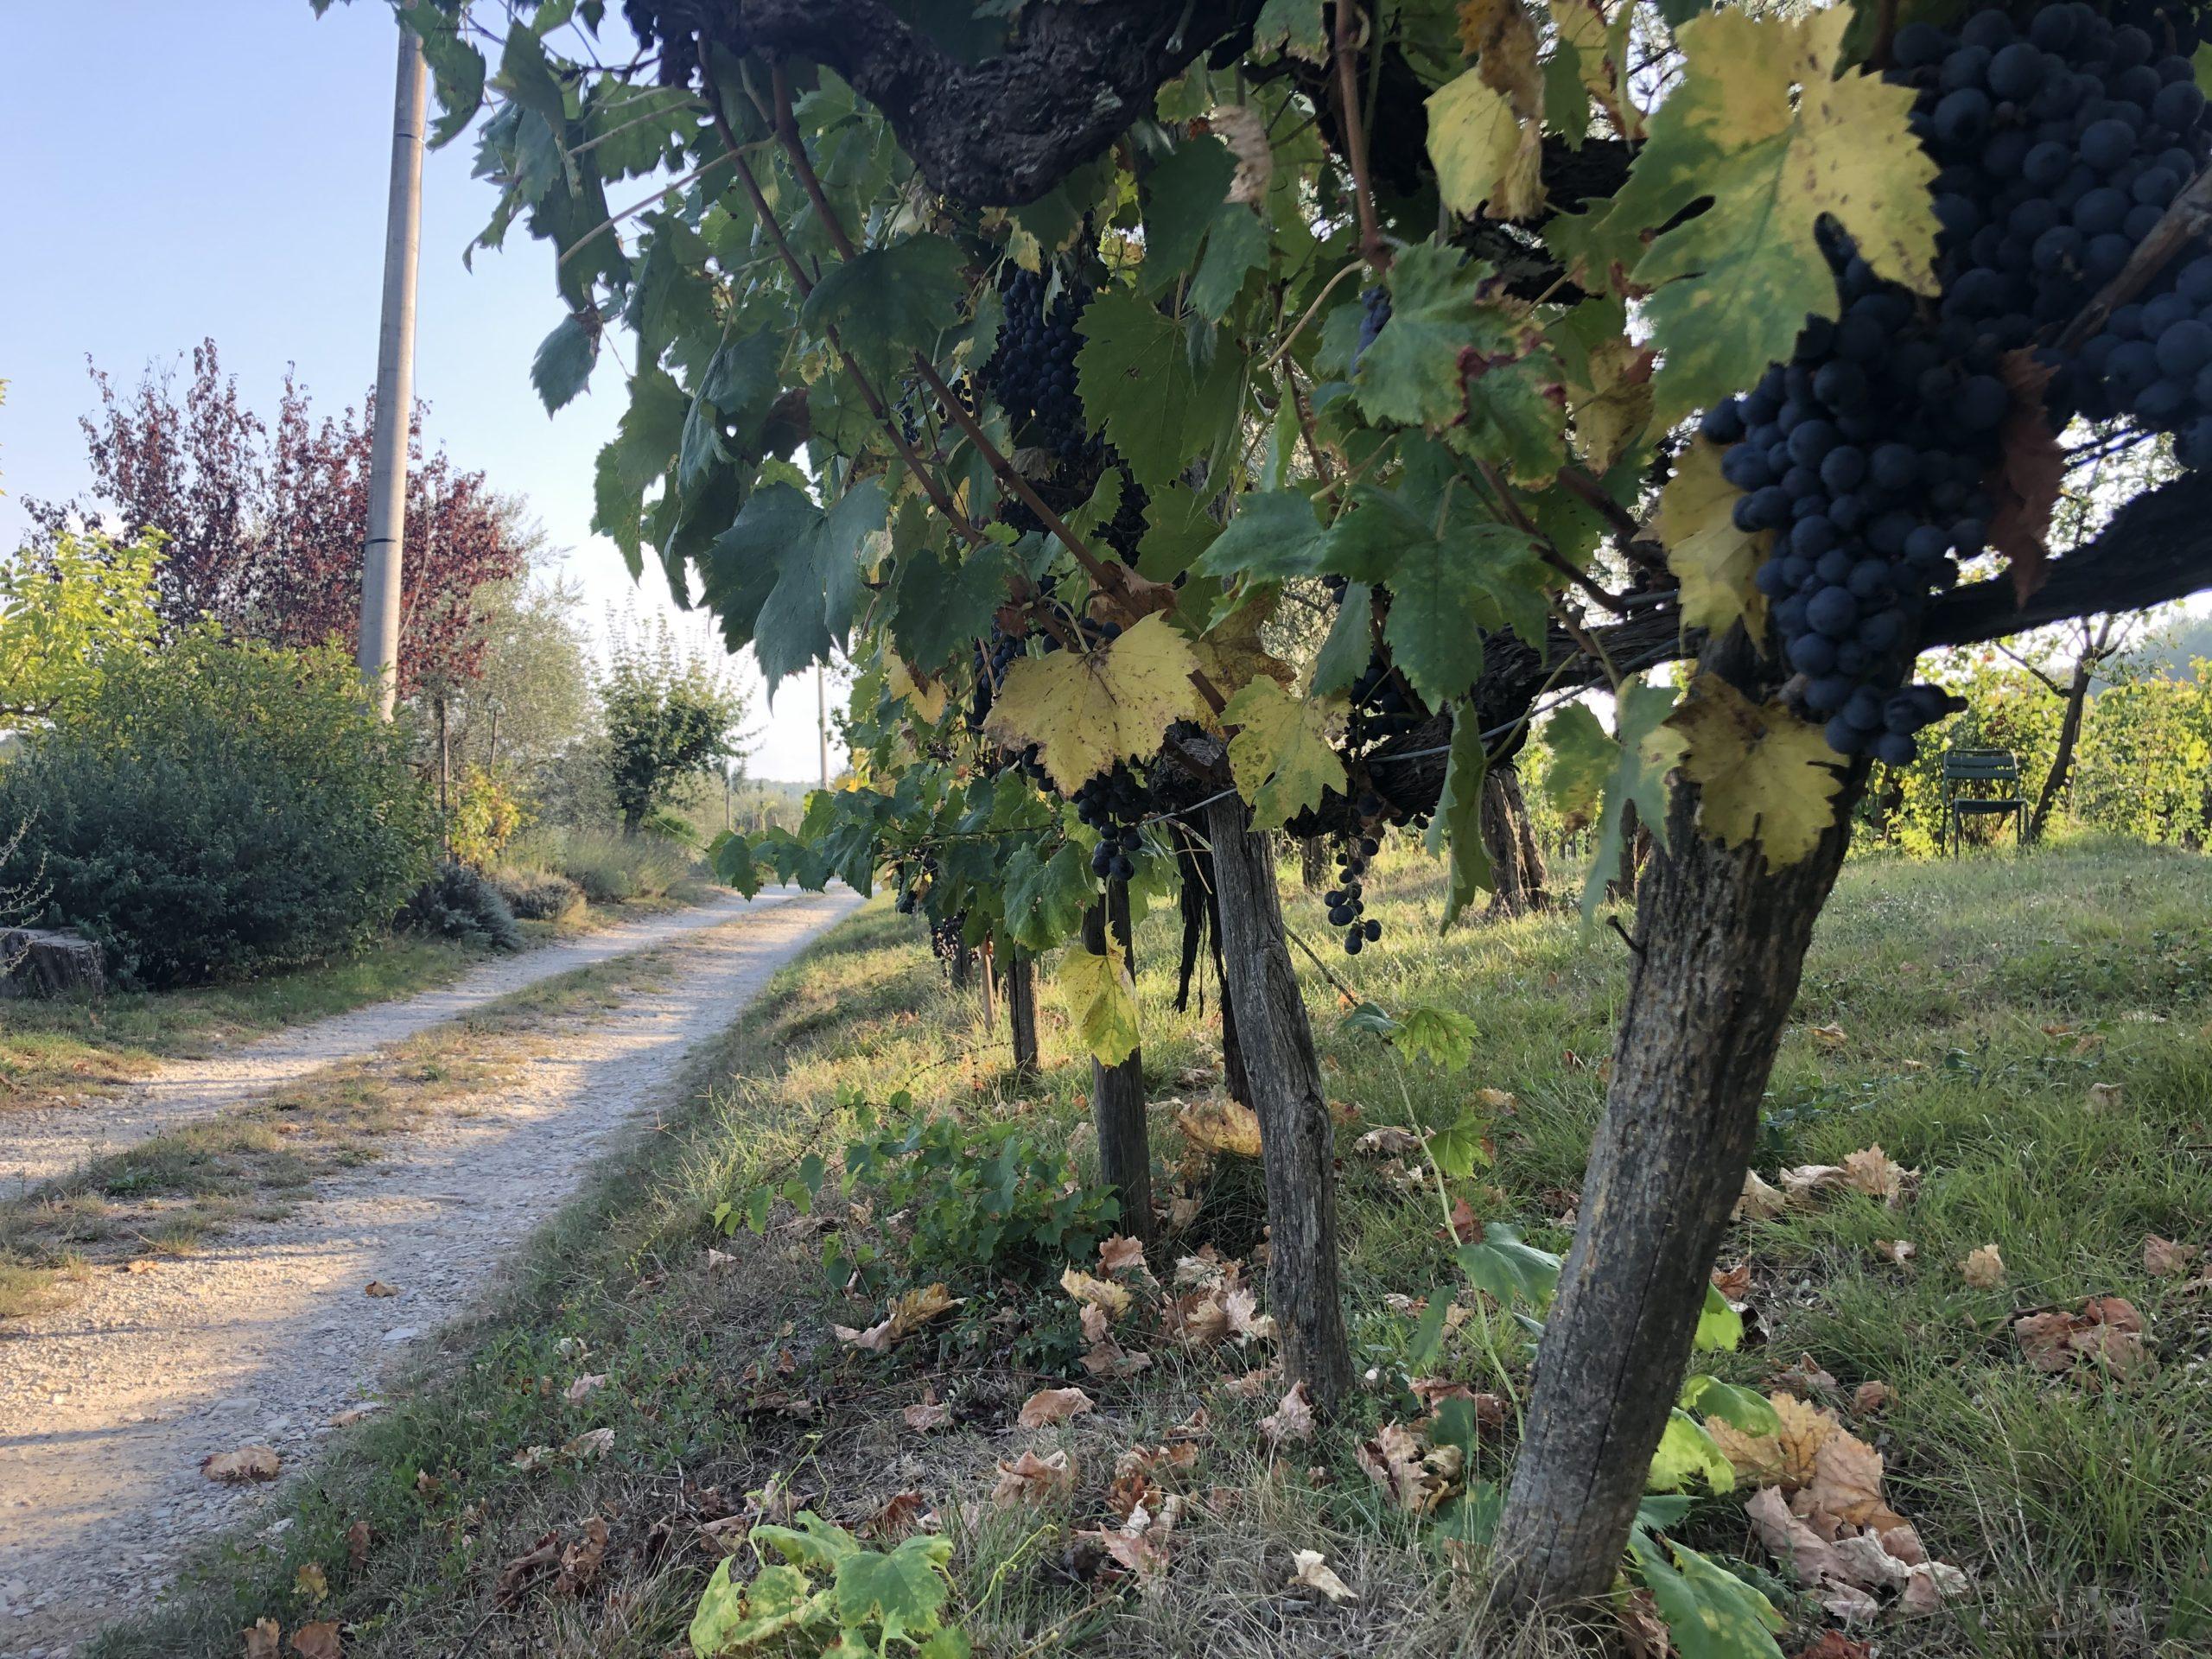 Sangiovese hike Chianti Classico